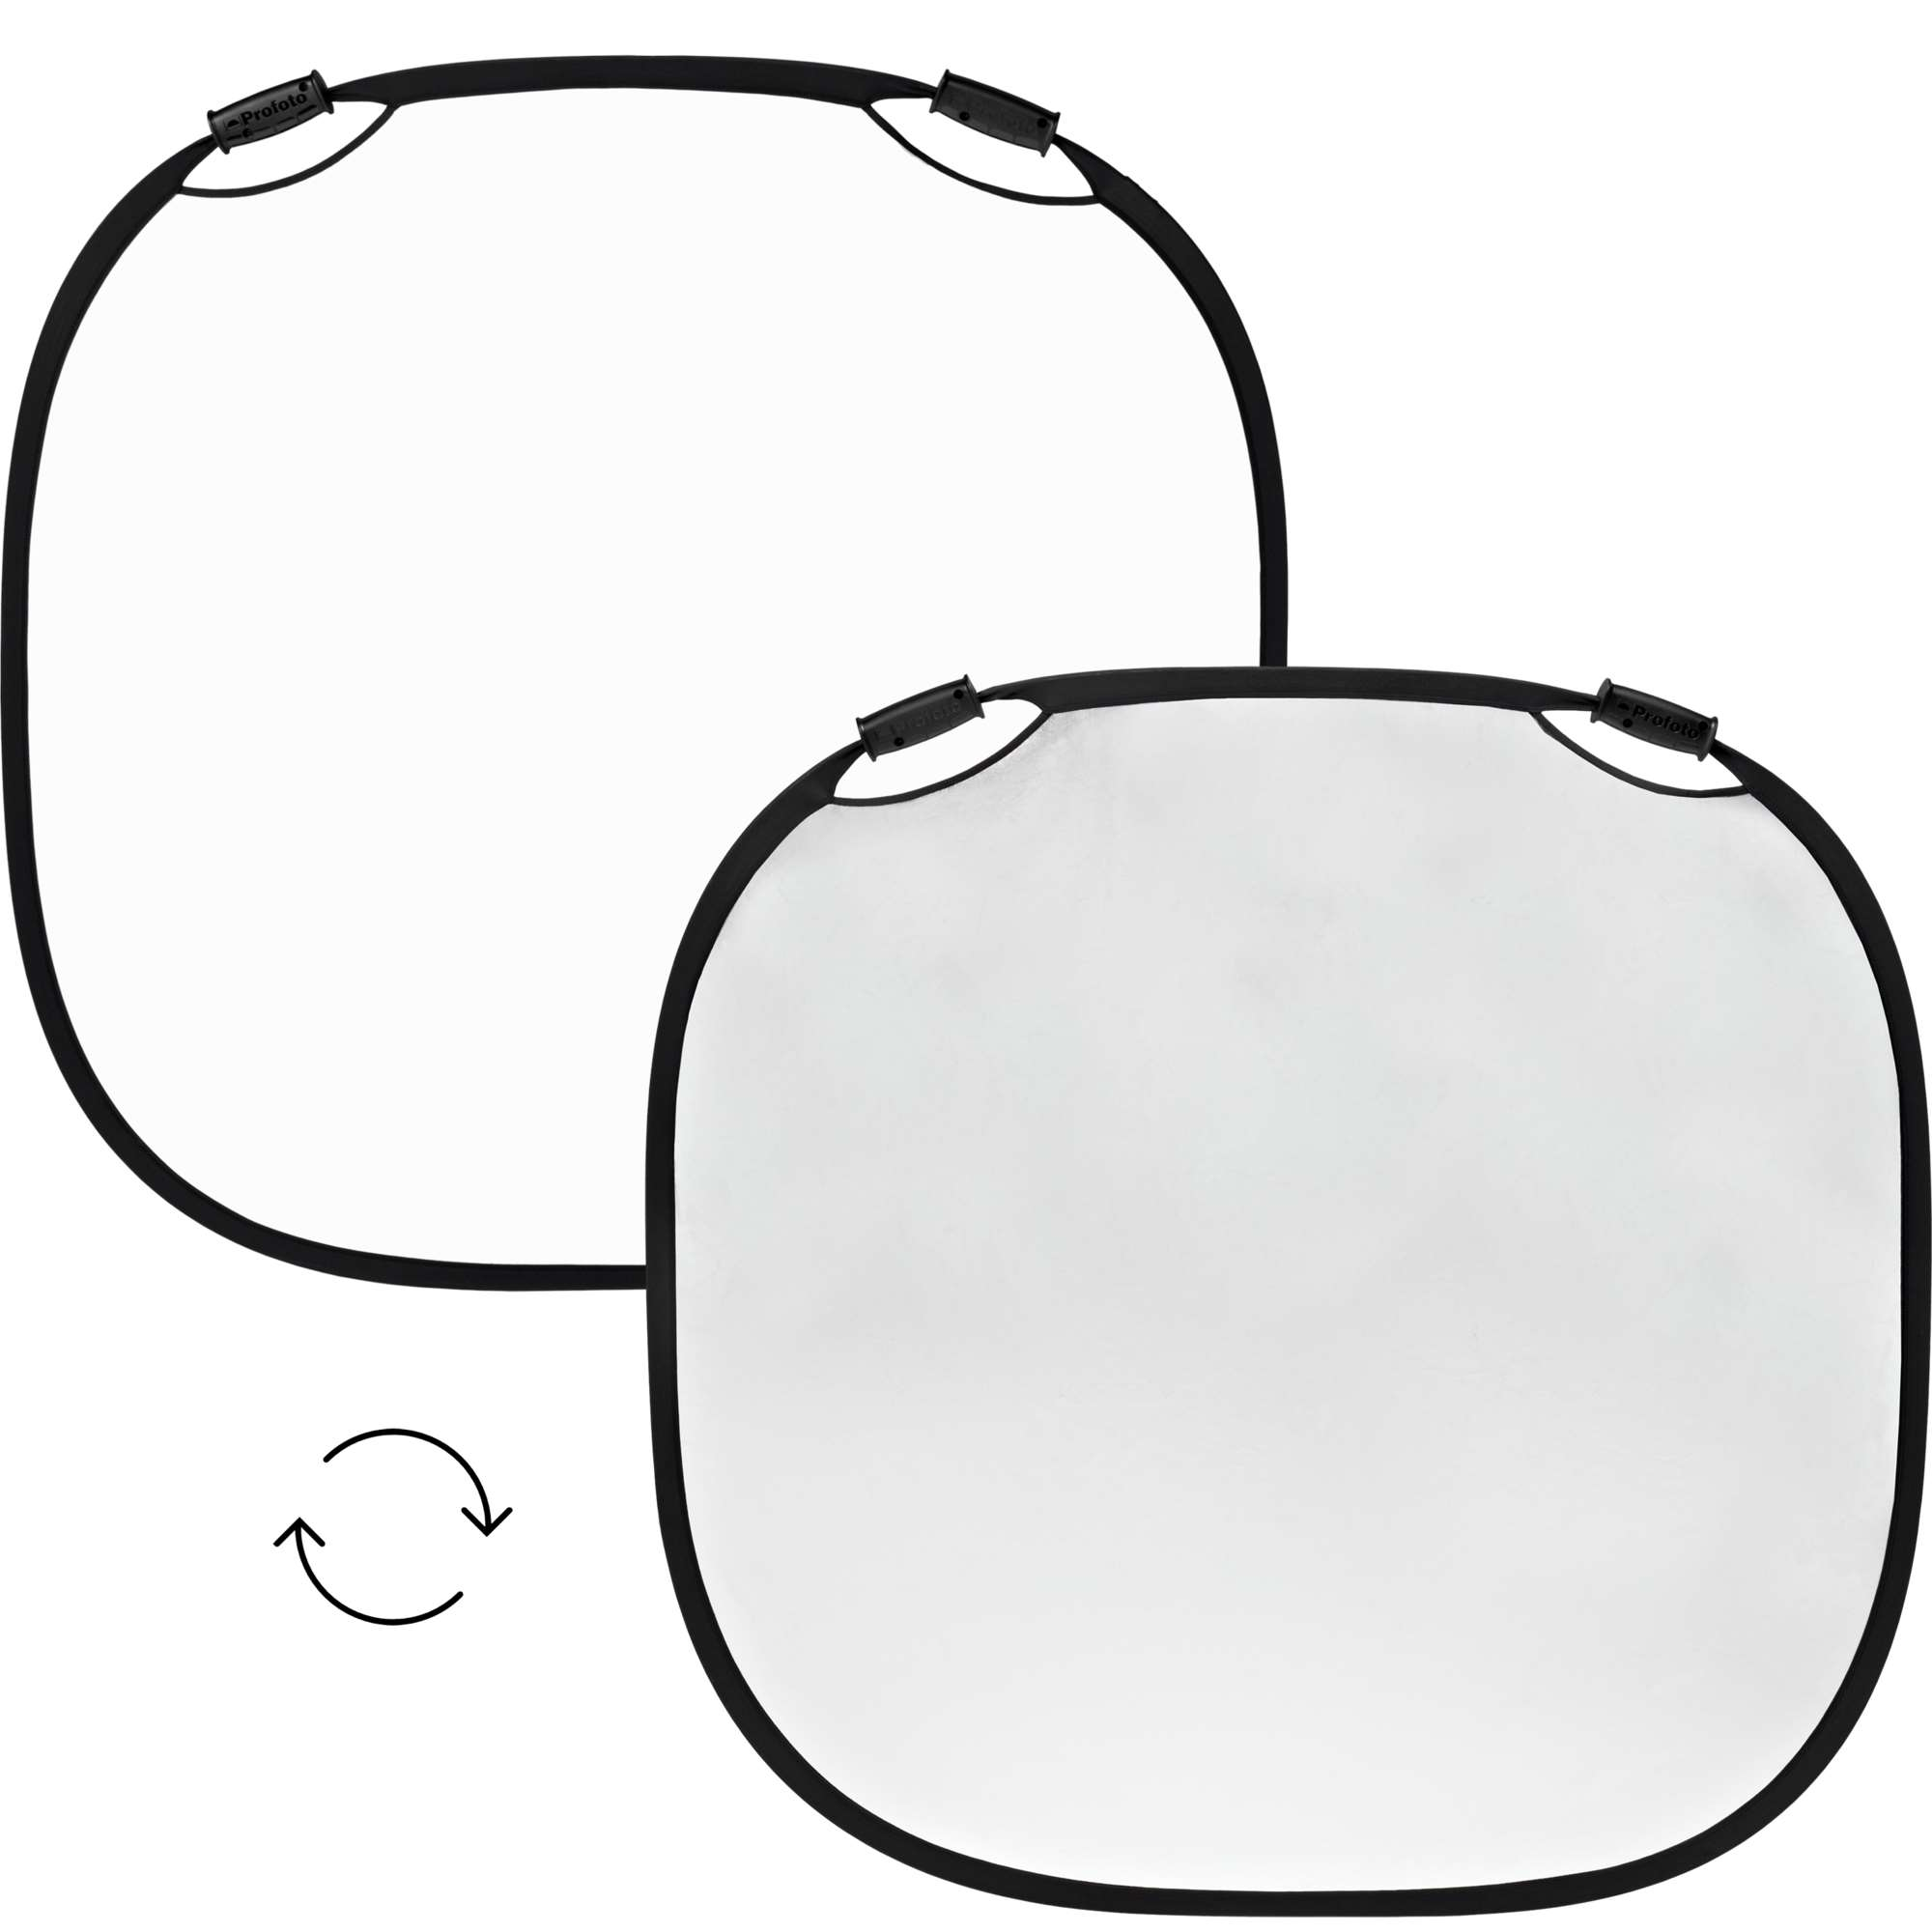 Profoto collapsible reflector l silver/white (100961)